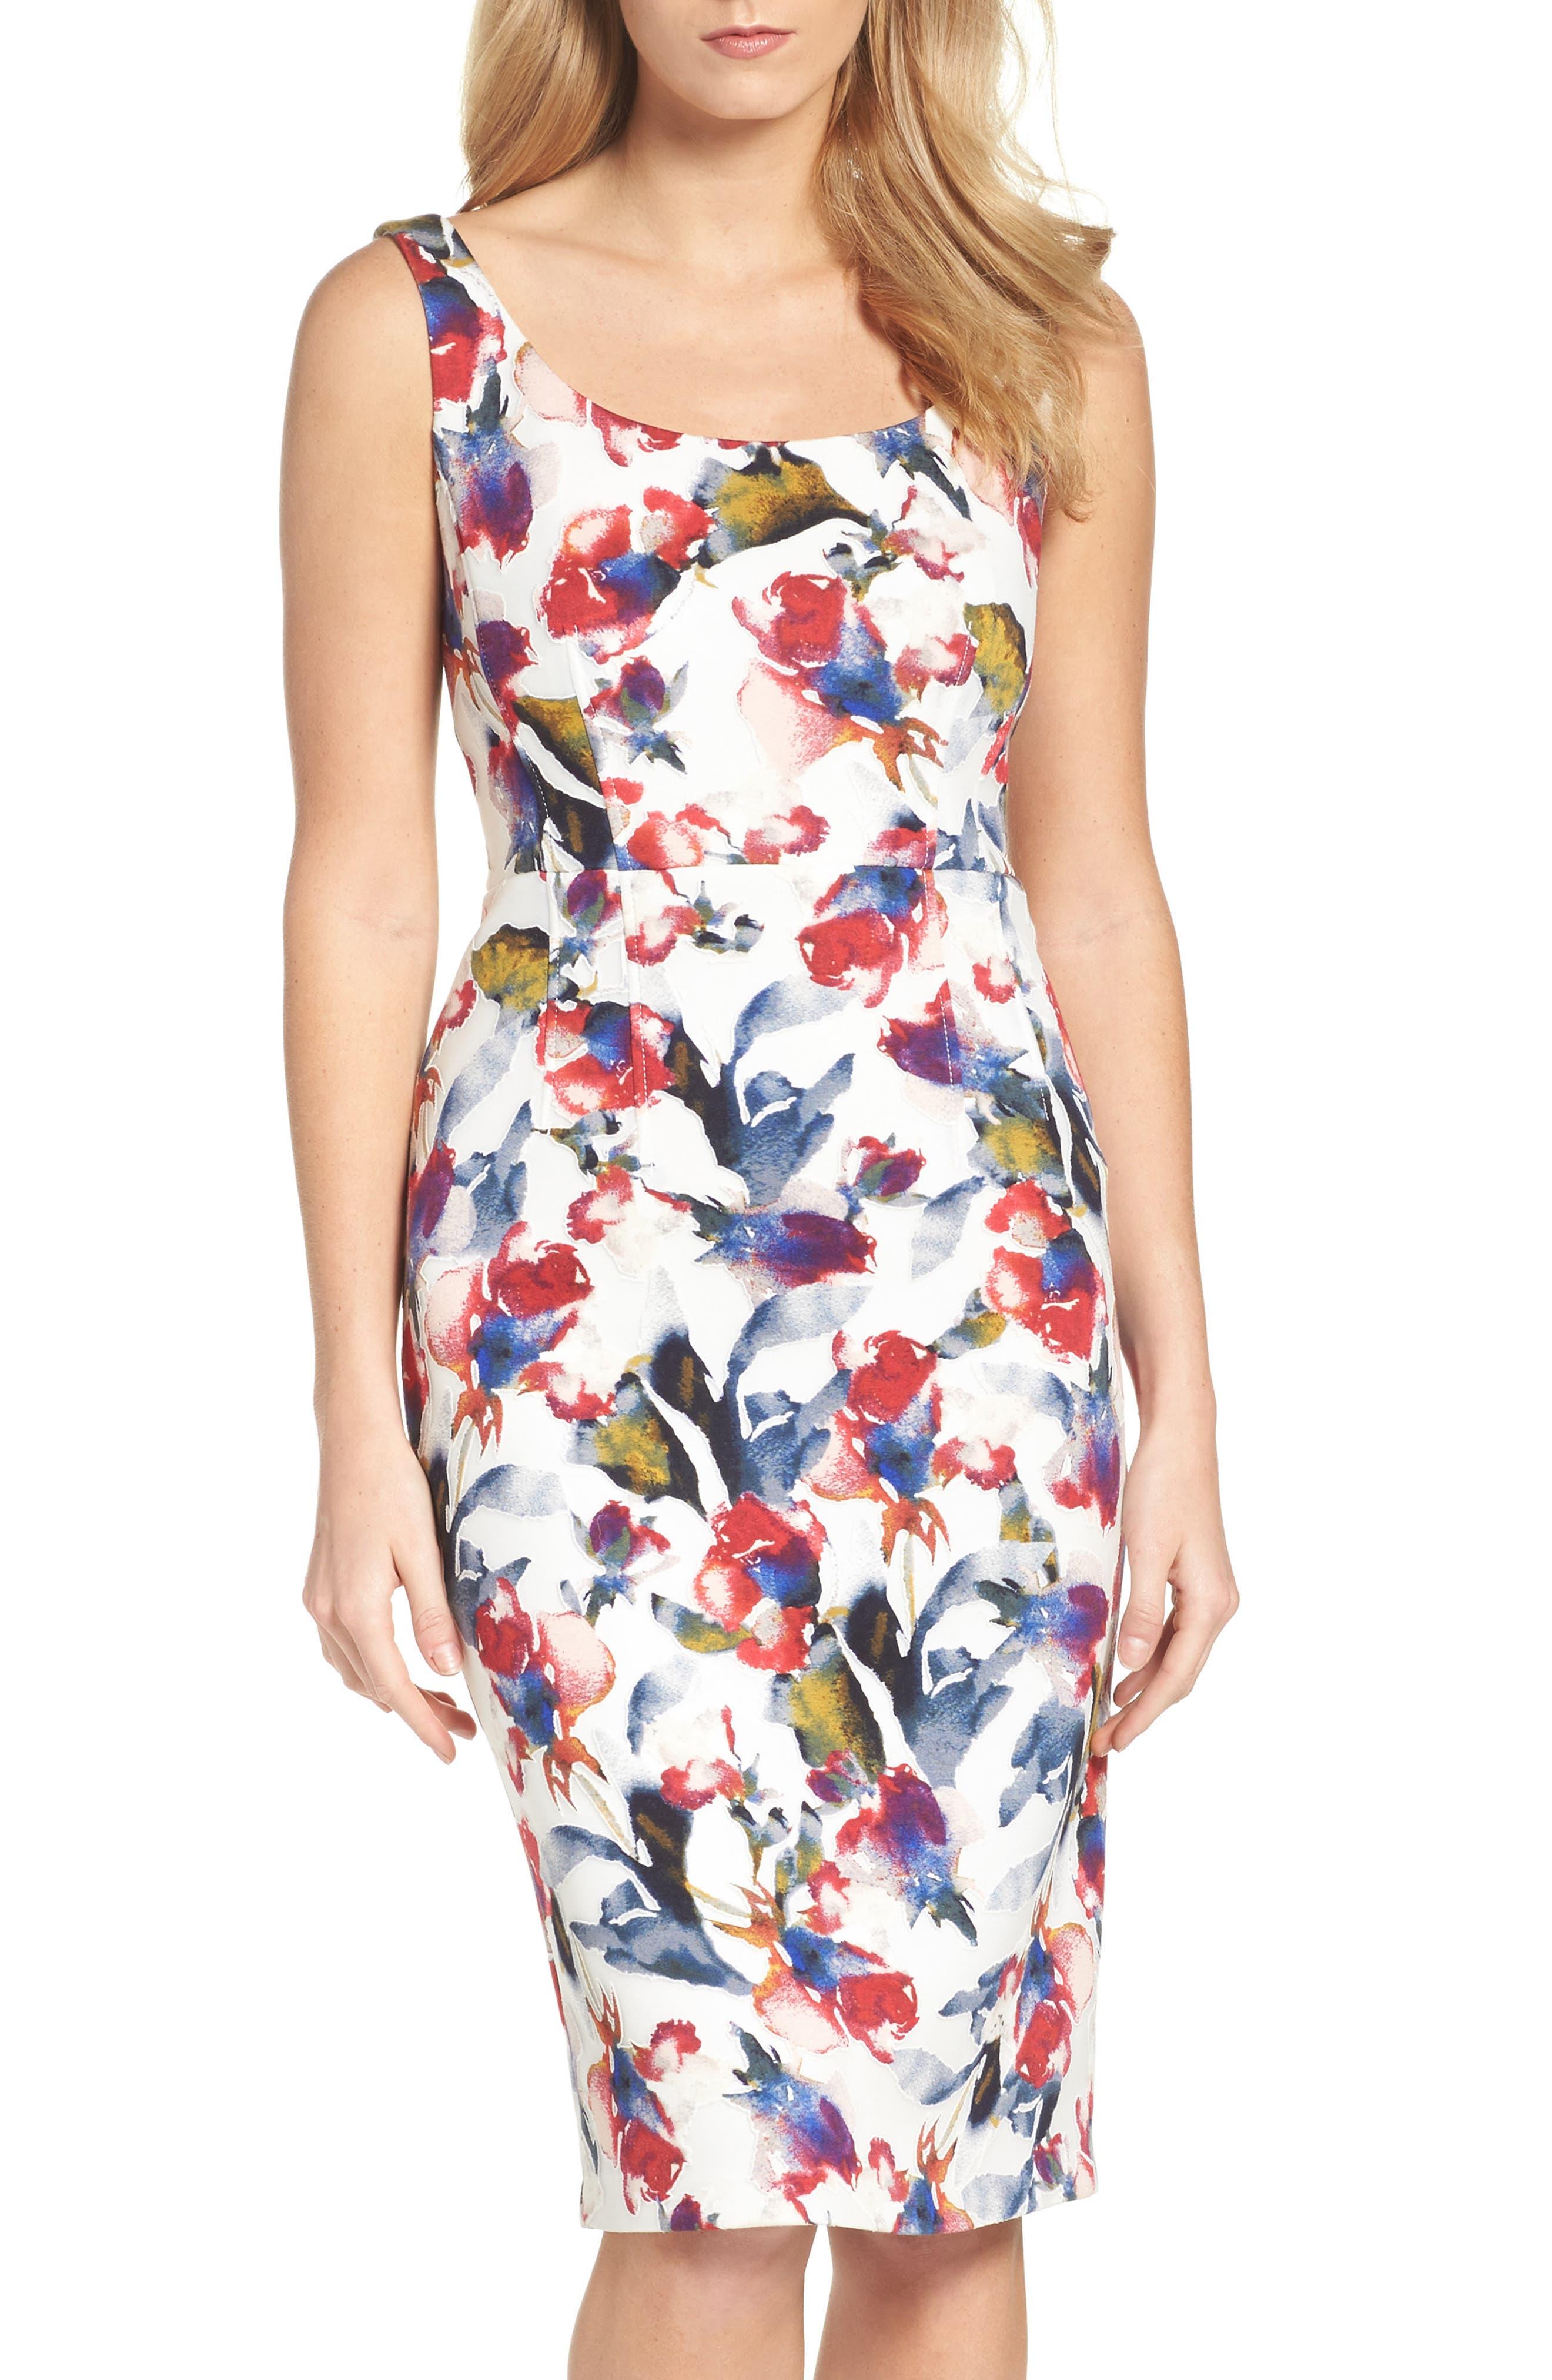 MAGGY LONDON, Tea Rose Dress, Main thumbnail 1, color, 145